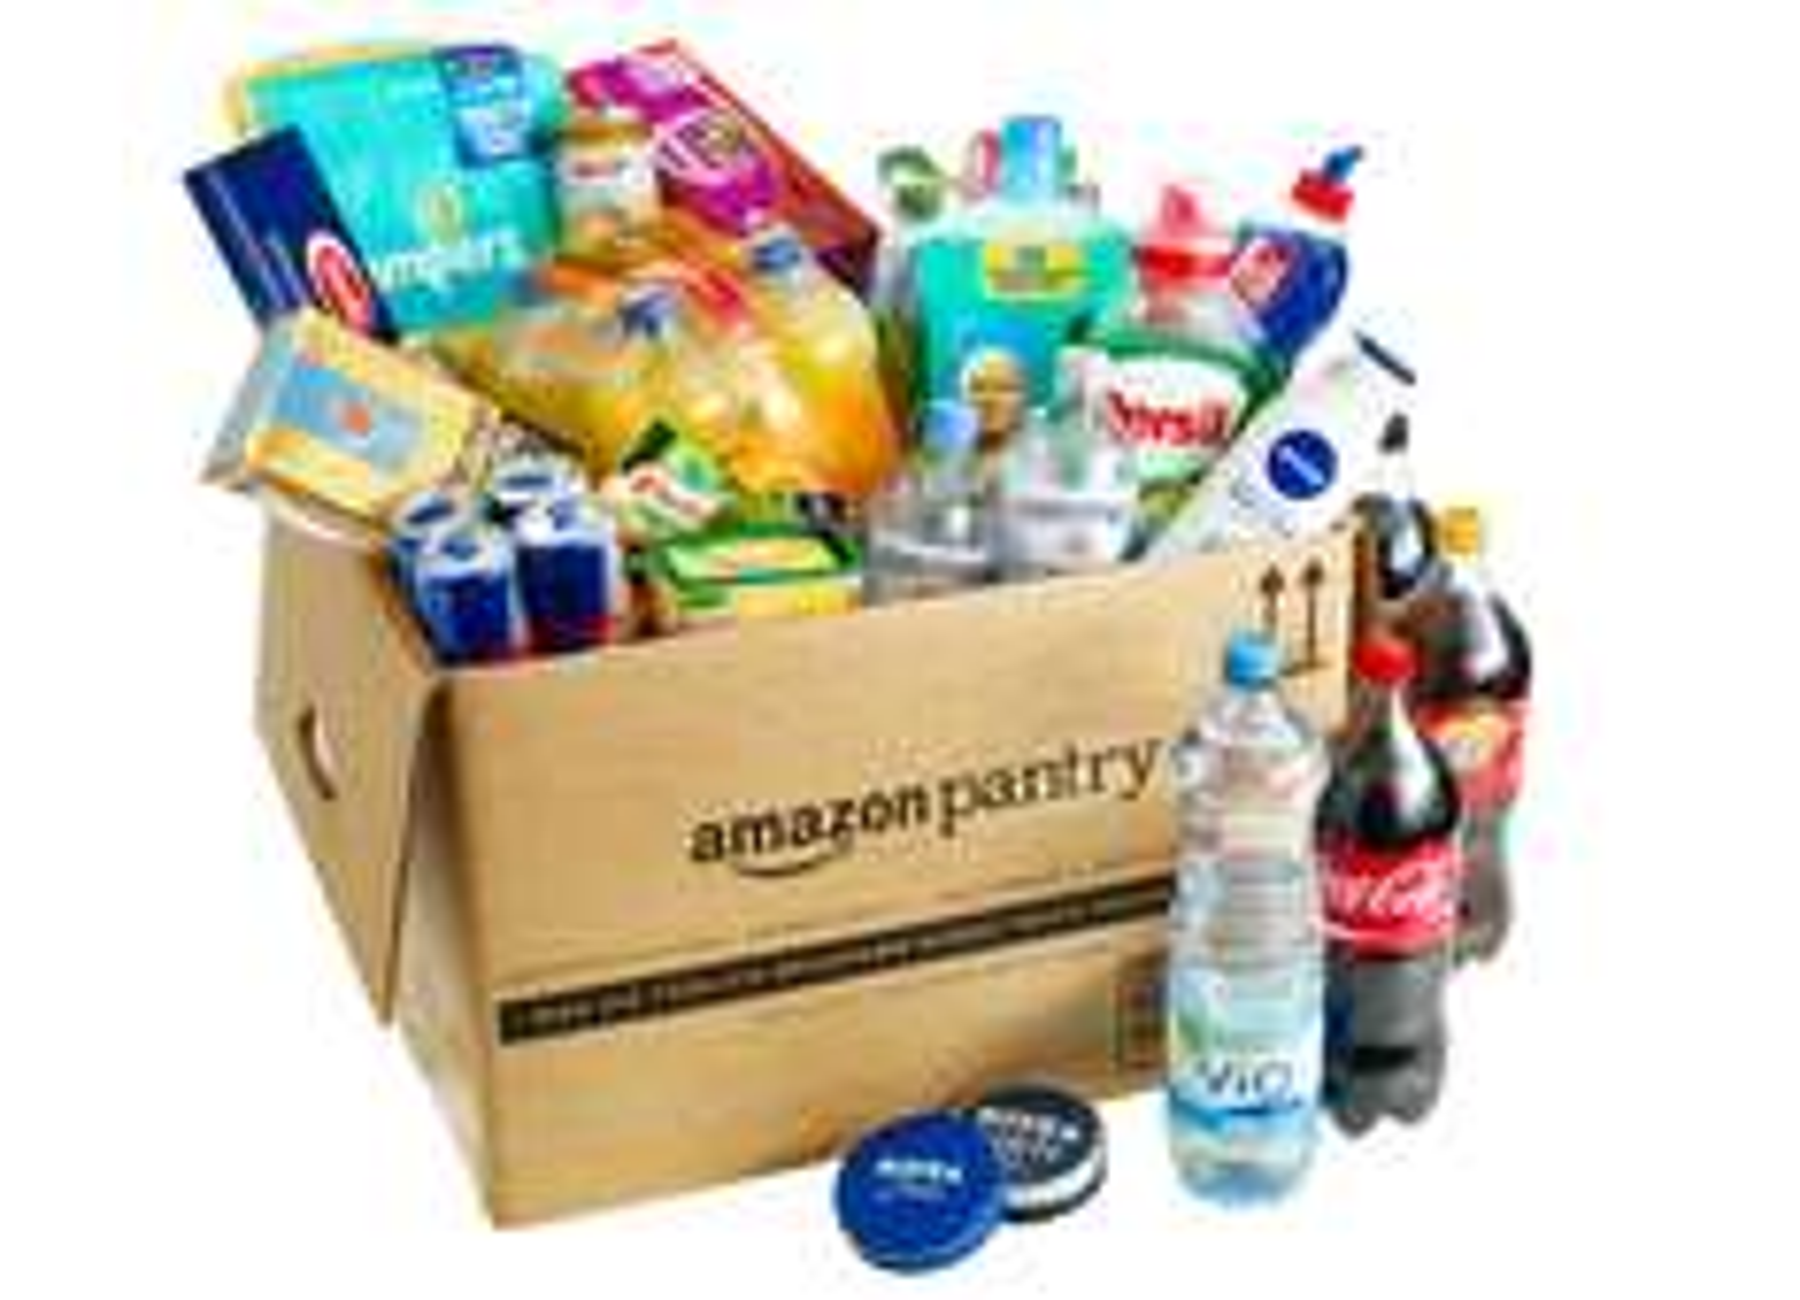 10€ Sofort-Rabatt auf P&G Produkte ab 25€ bei Amazon Pantry (Prime)